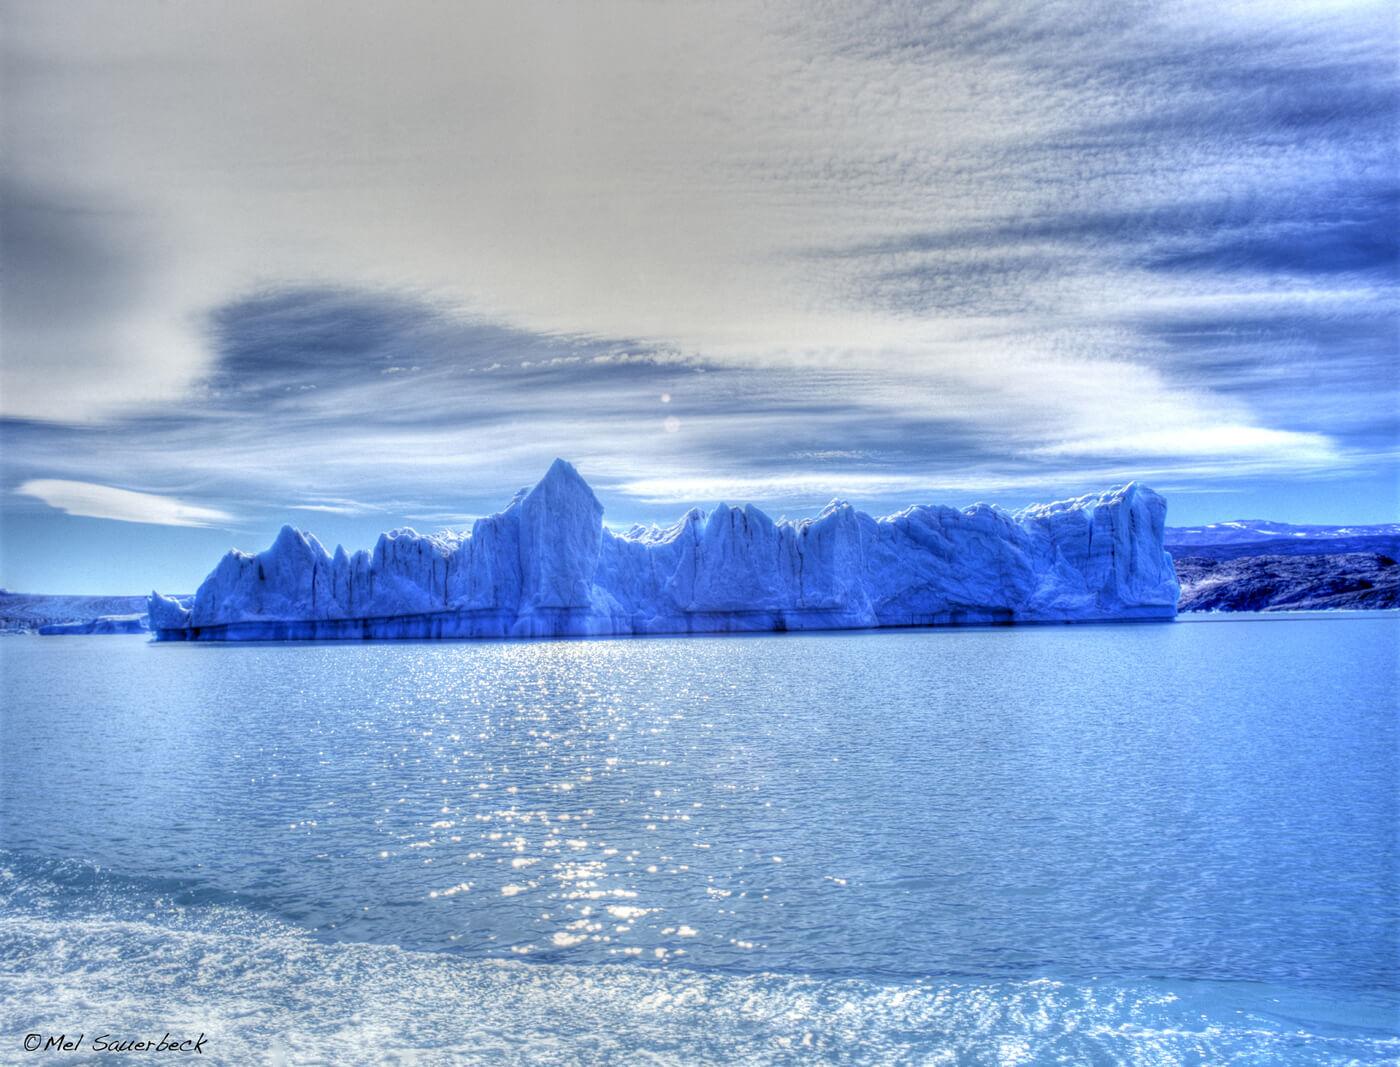 Ice berg, Lago Argintino